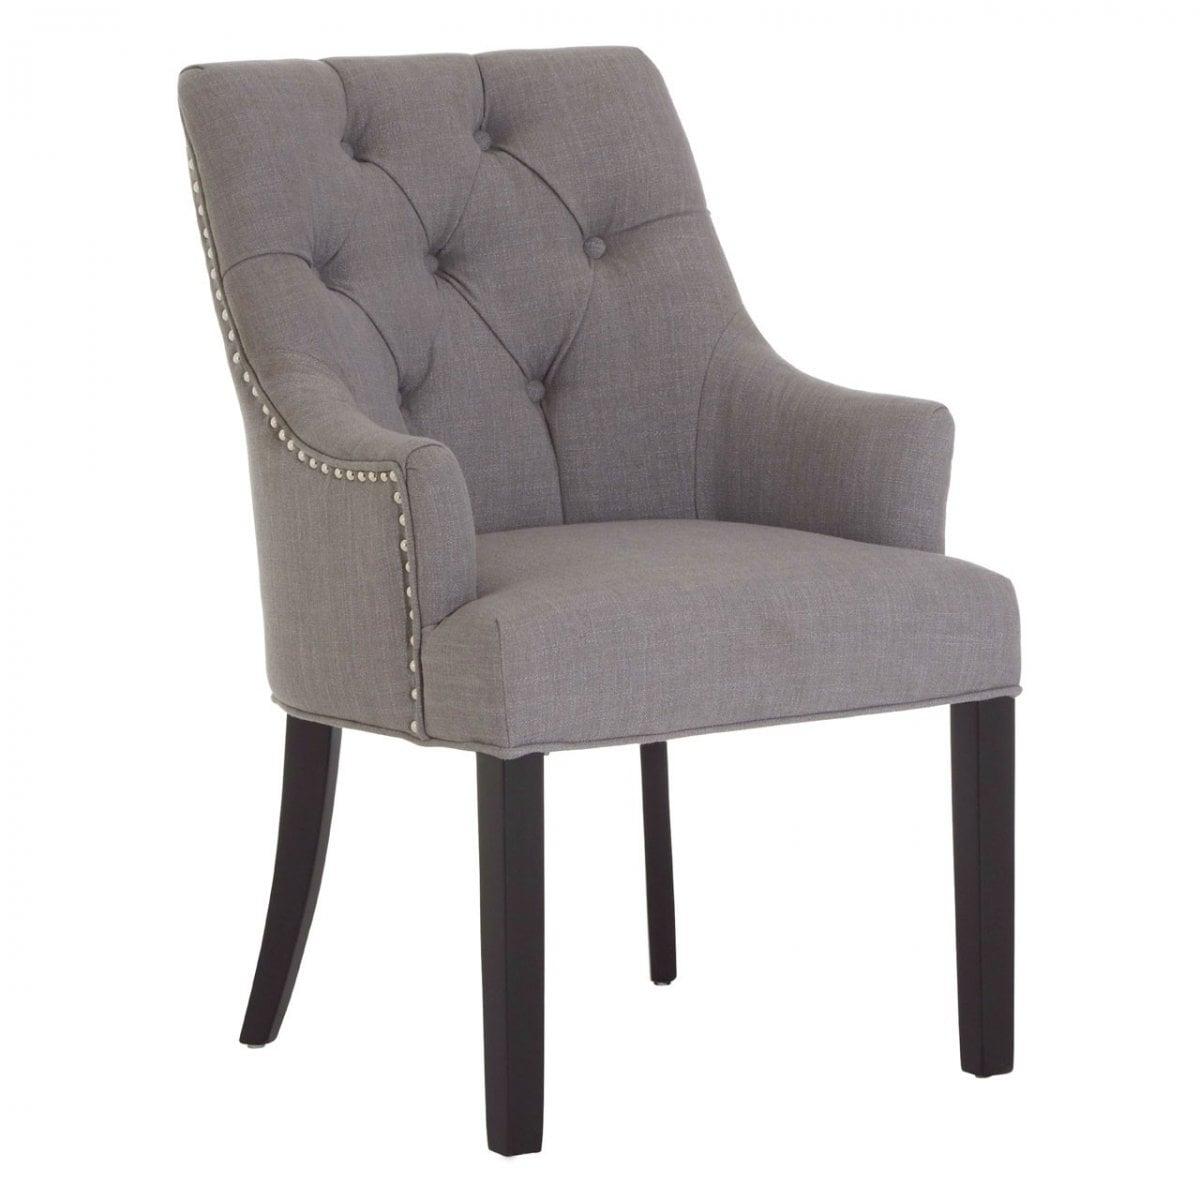 Kensington Studded Pair Of Dining Chairs Grey Swanky